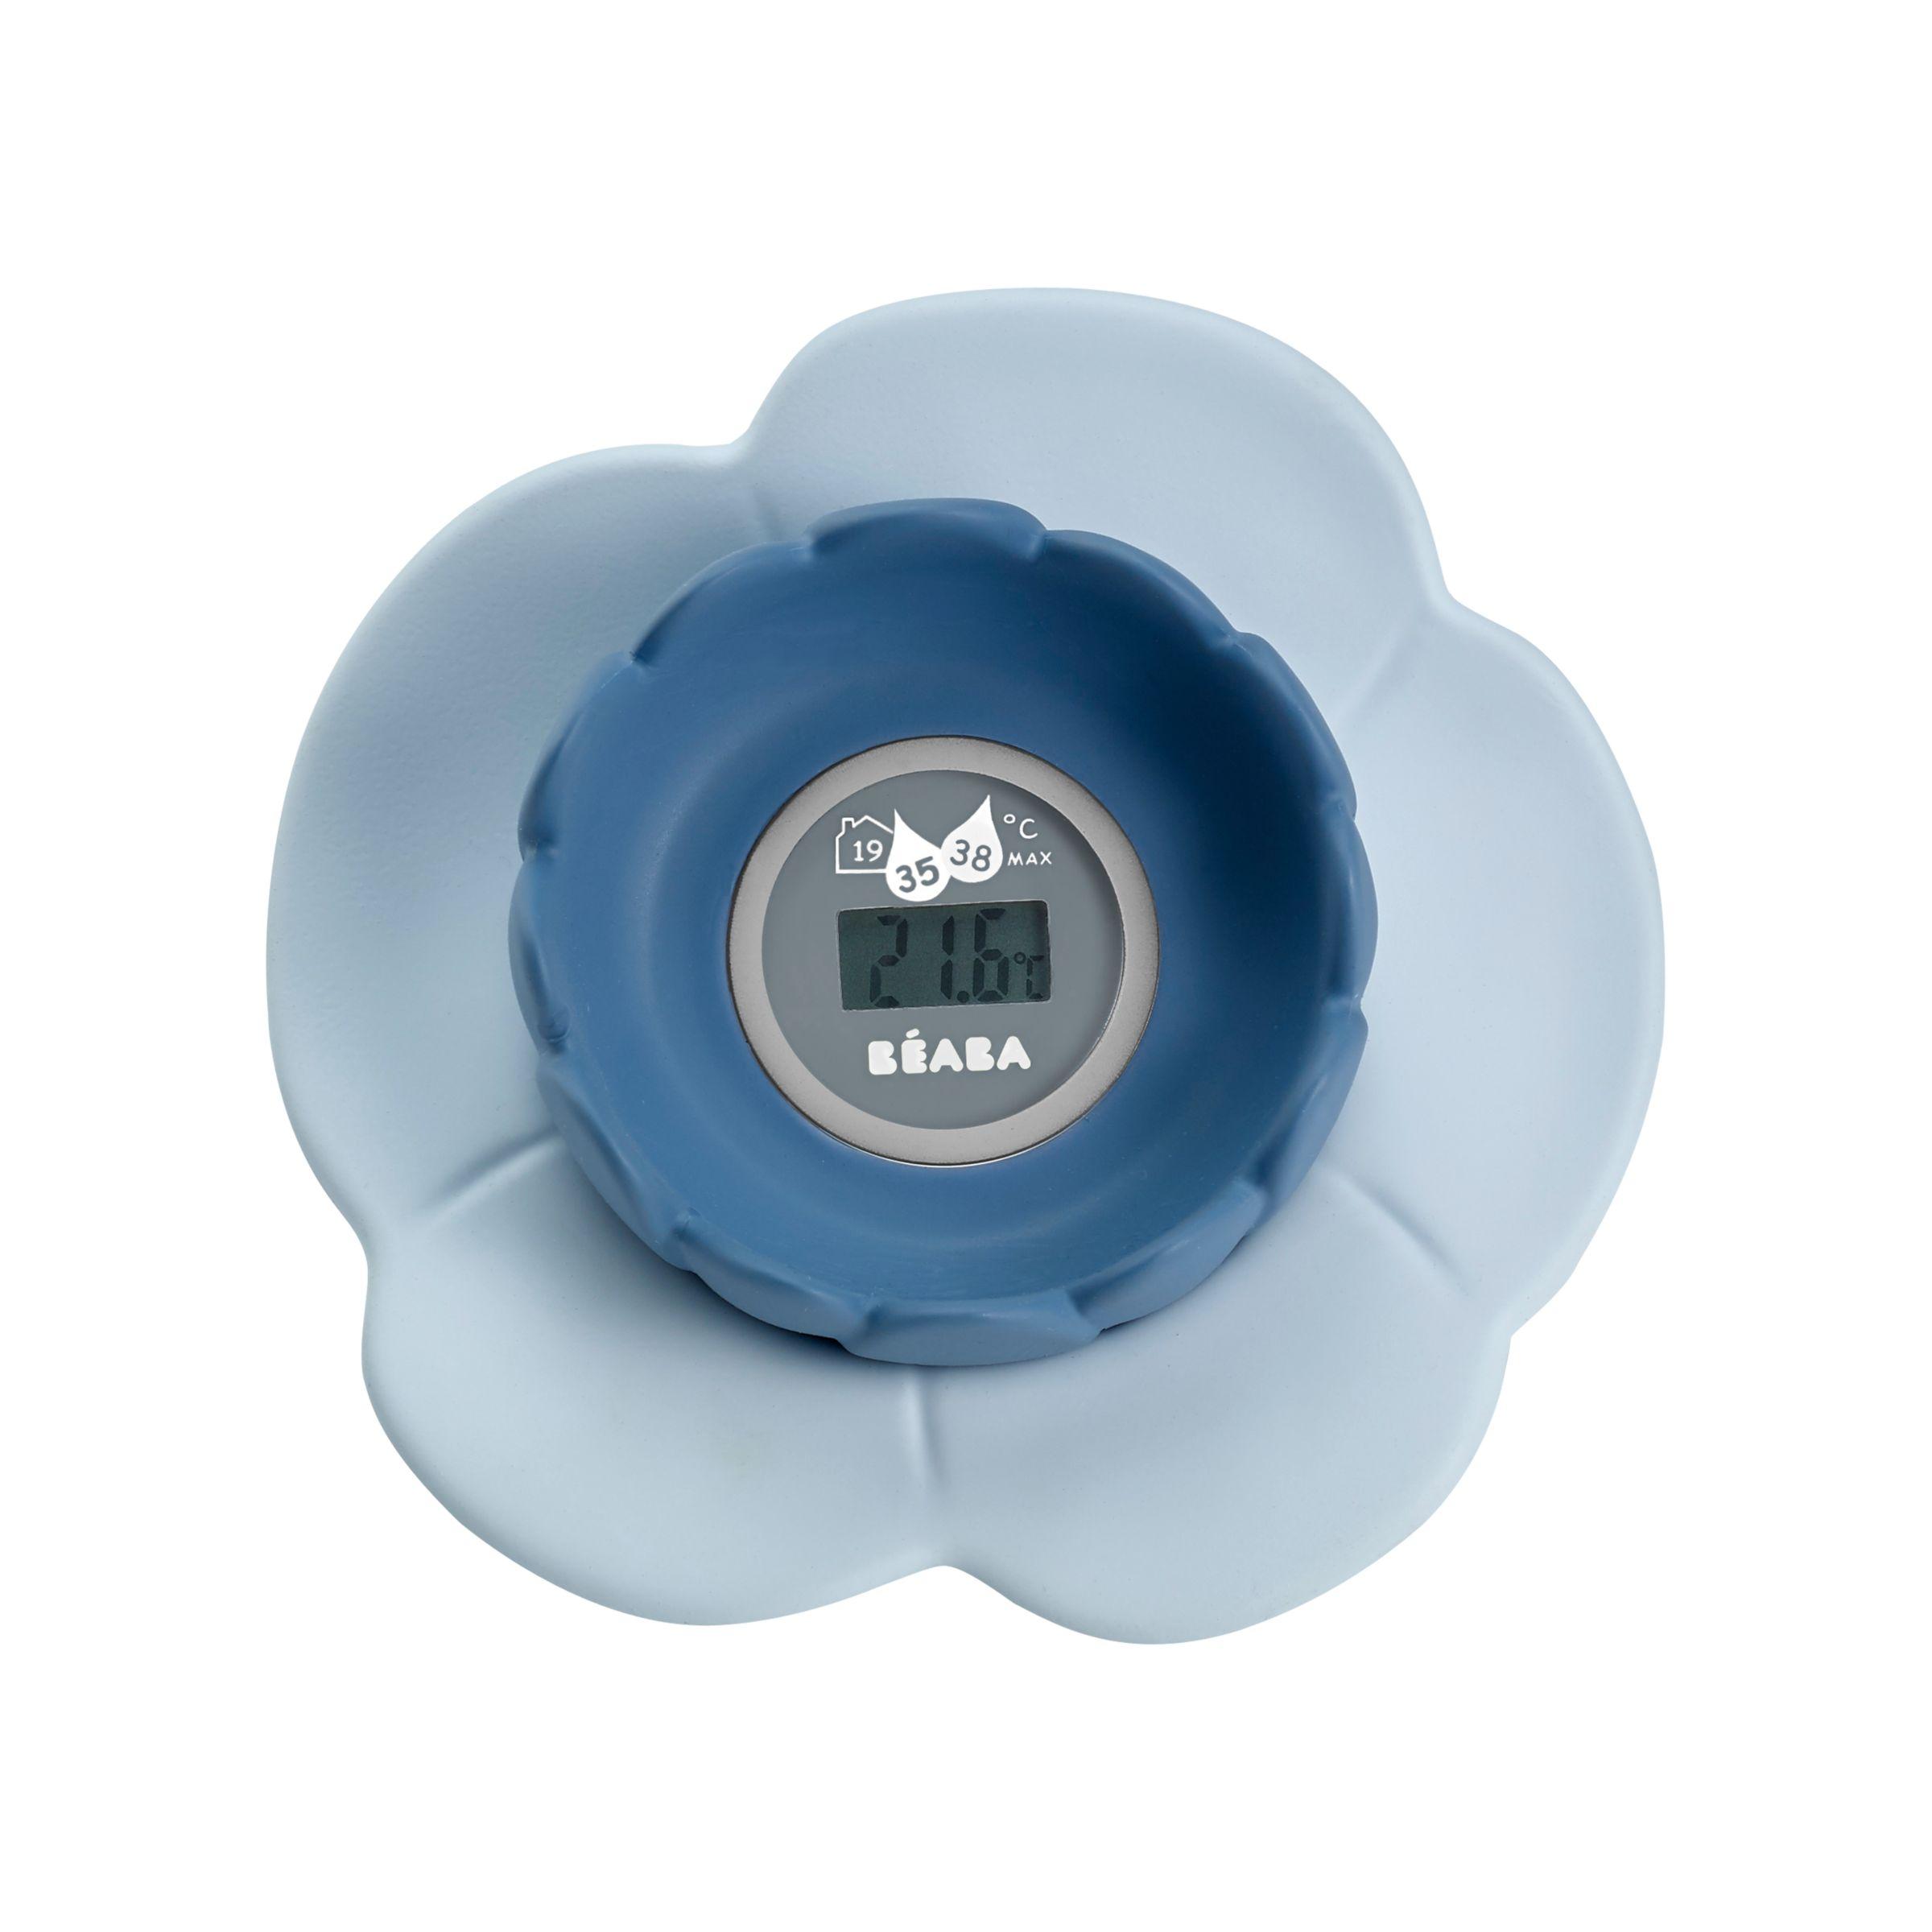 Beaba Beaba Lotus Bath And Room Baby Thermometer, Blue